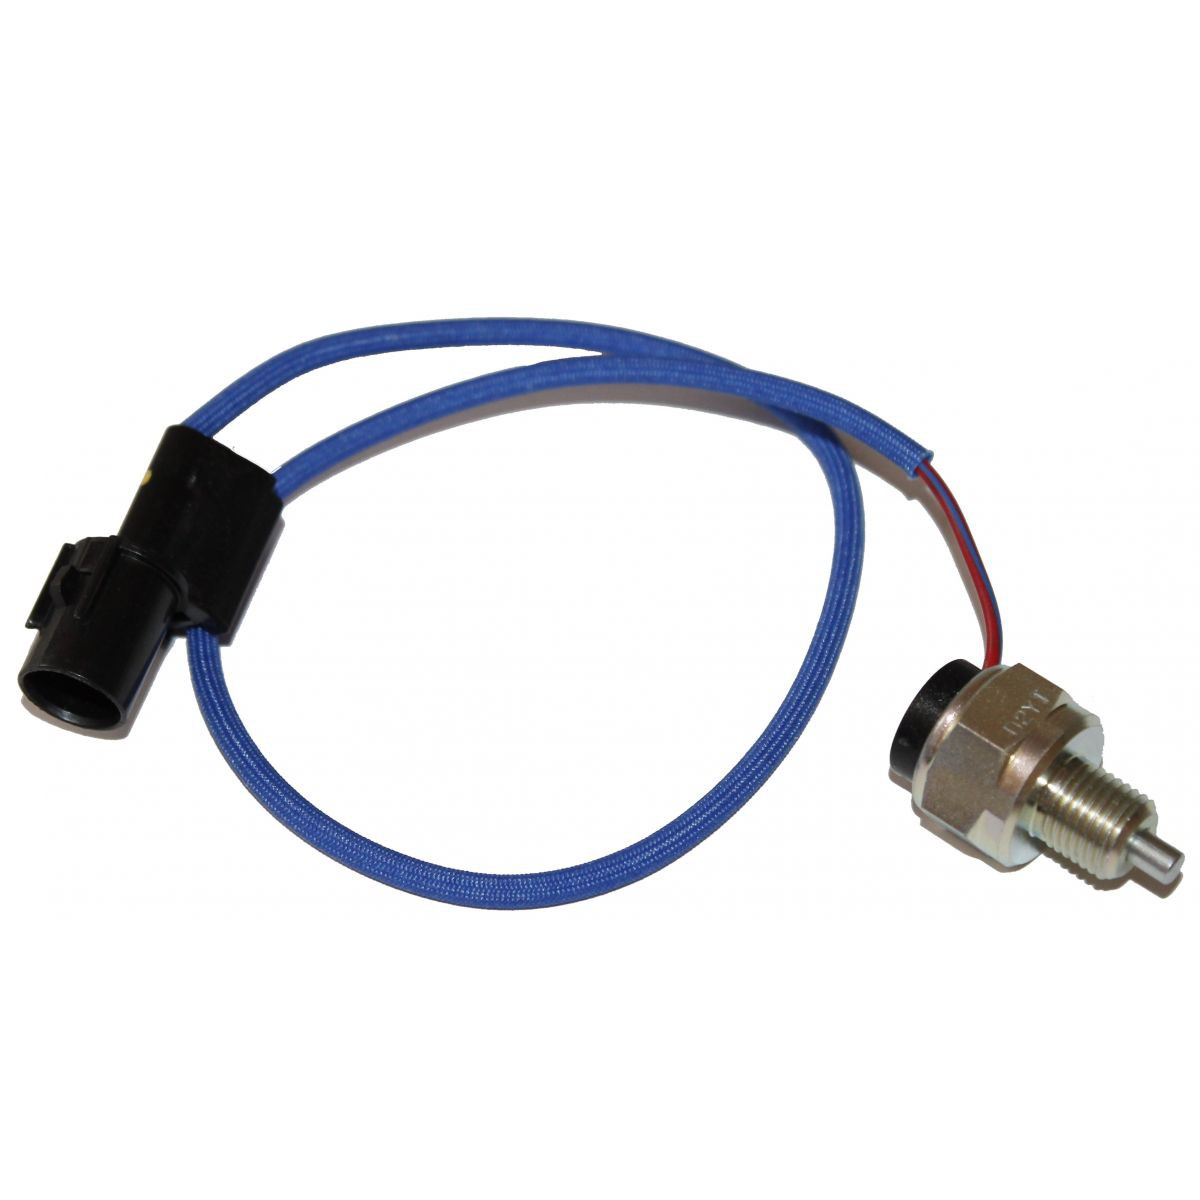 Sensor Interruptor 4x4 L200 Triton Dakar - MR580152 ou MR453315